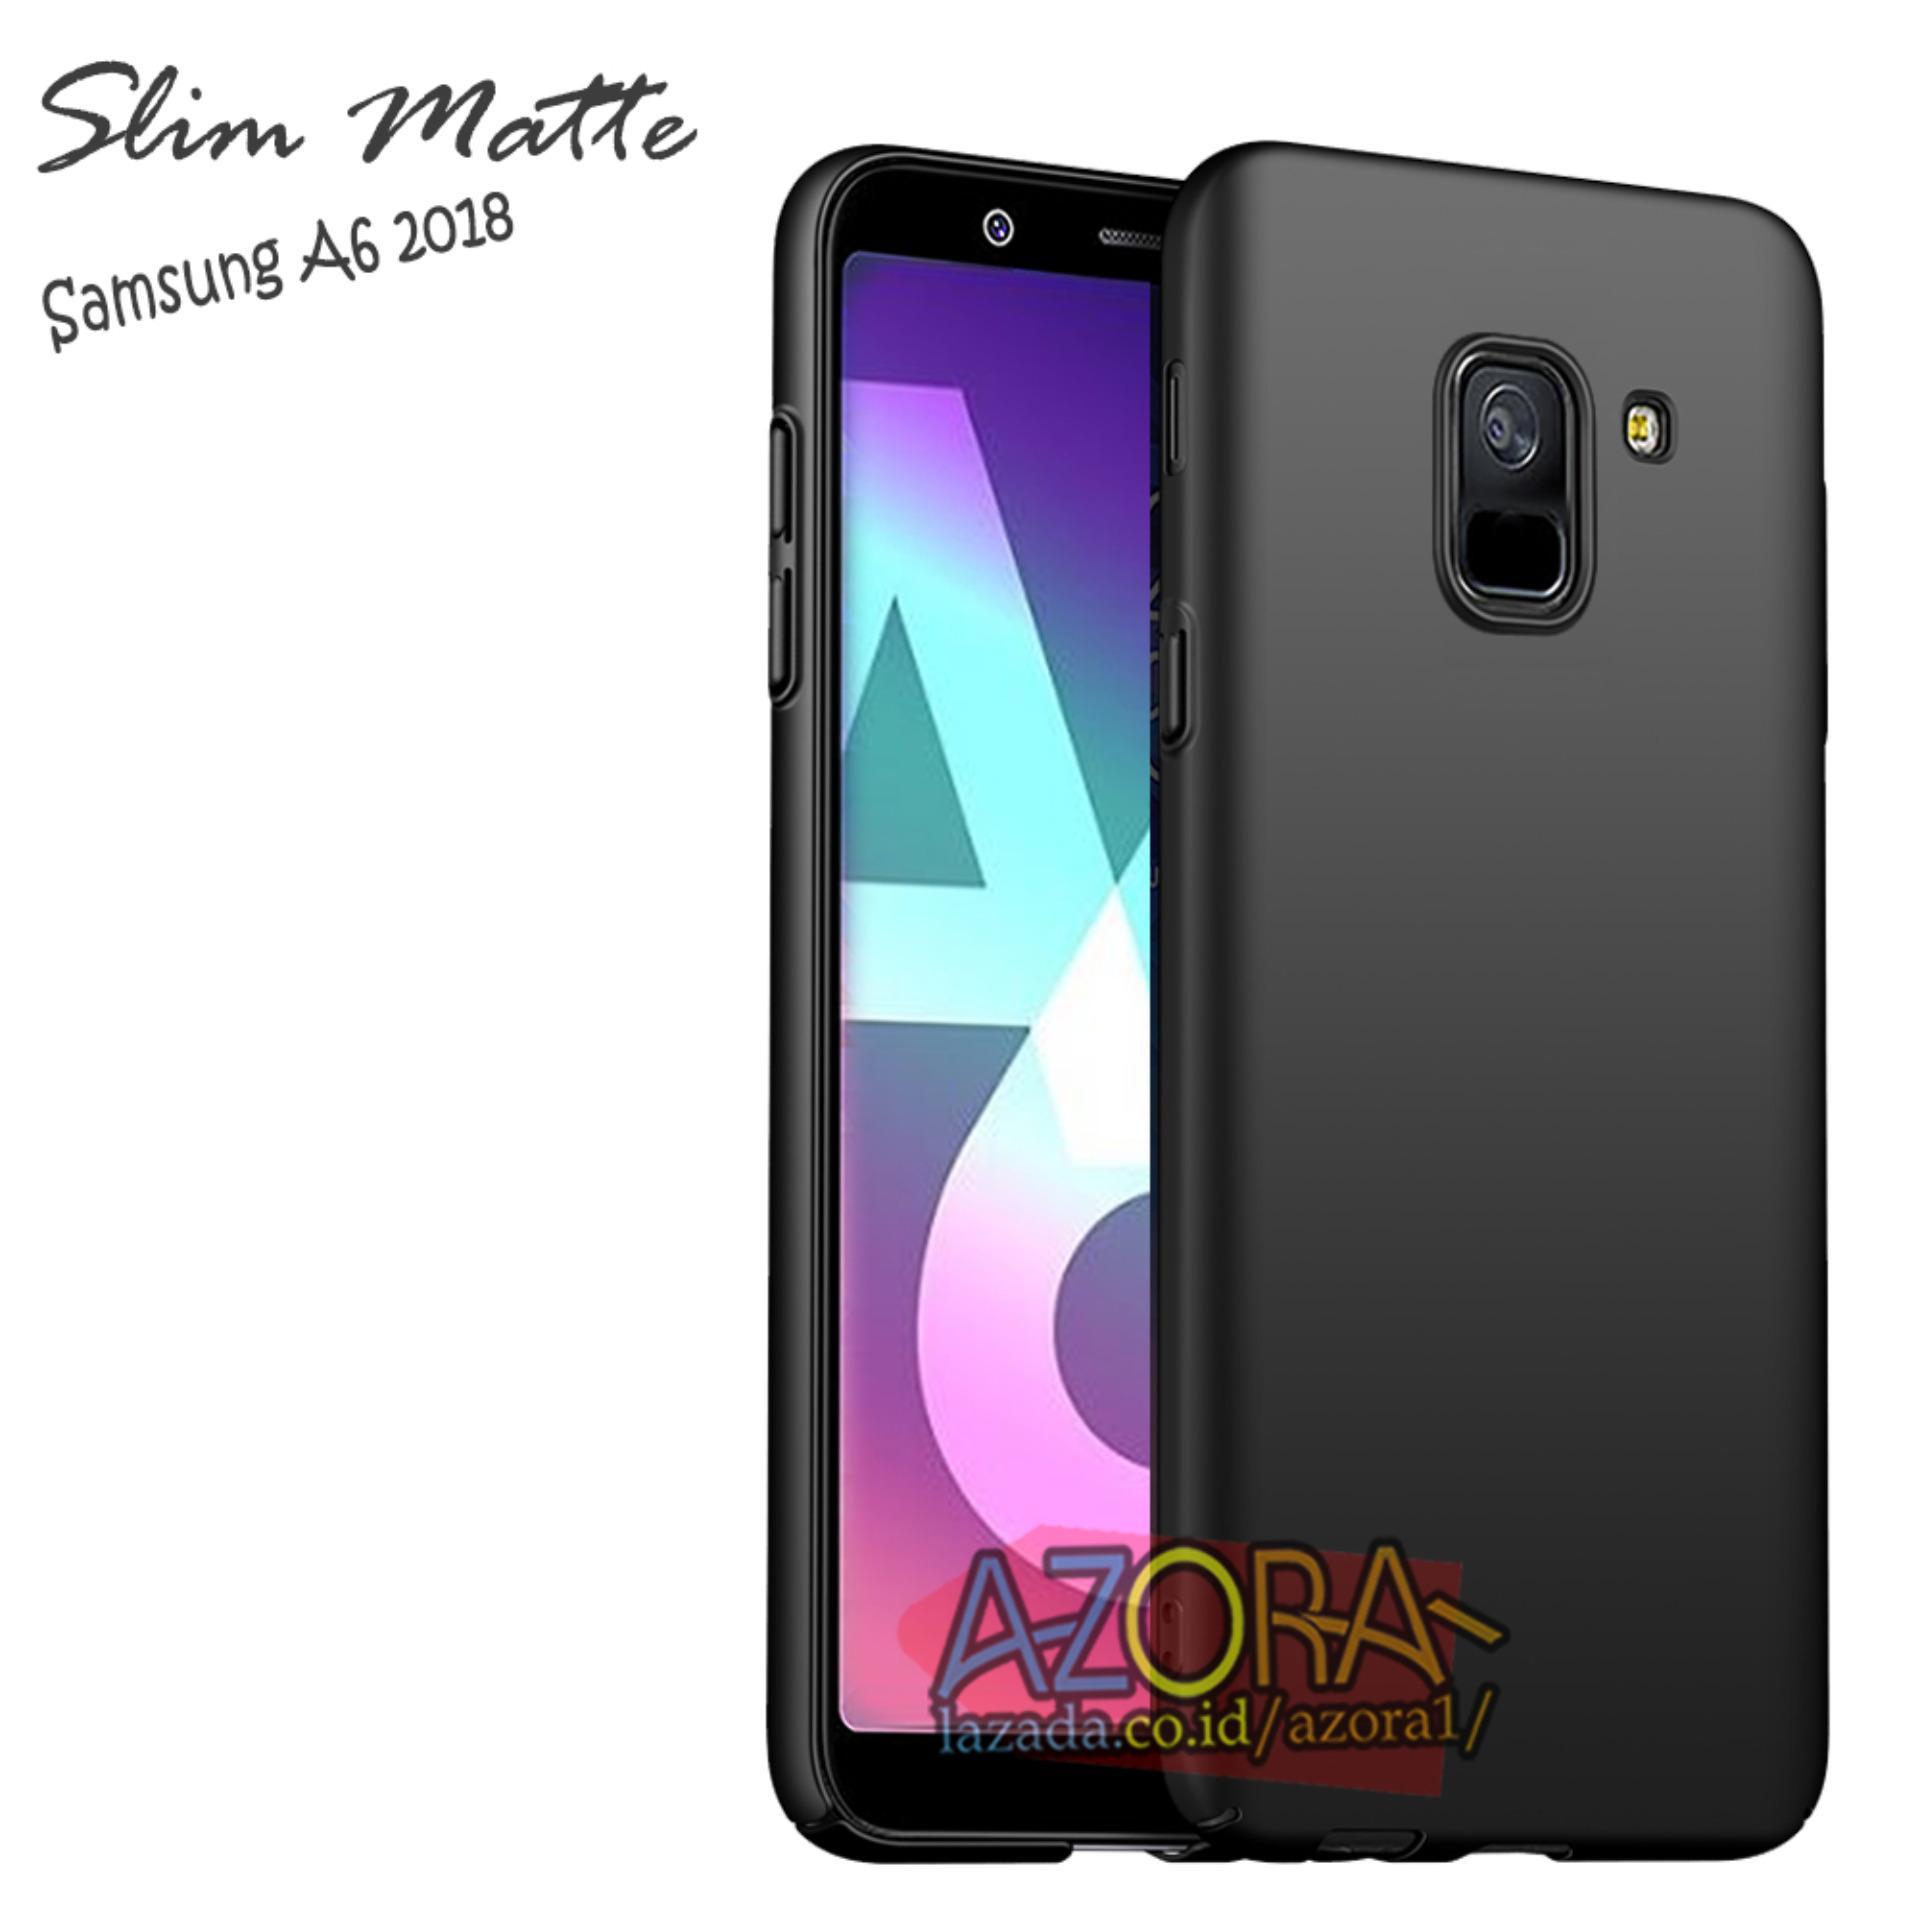 Case Slim Black Matte Samsung Galaxy A6 2018 Baby Skin Softcase Ultra Thin Jelly Silikon Babyskin